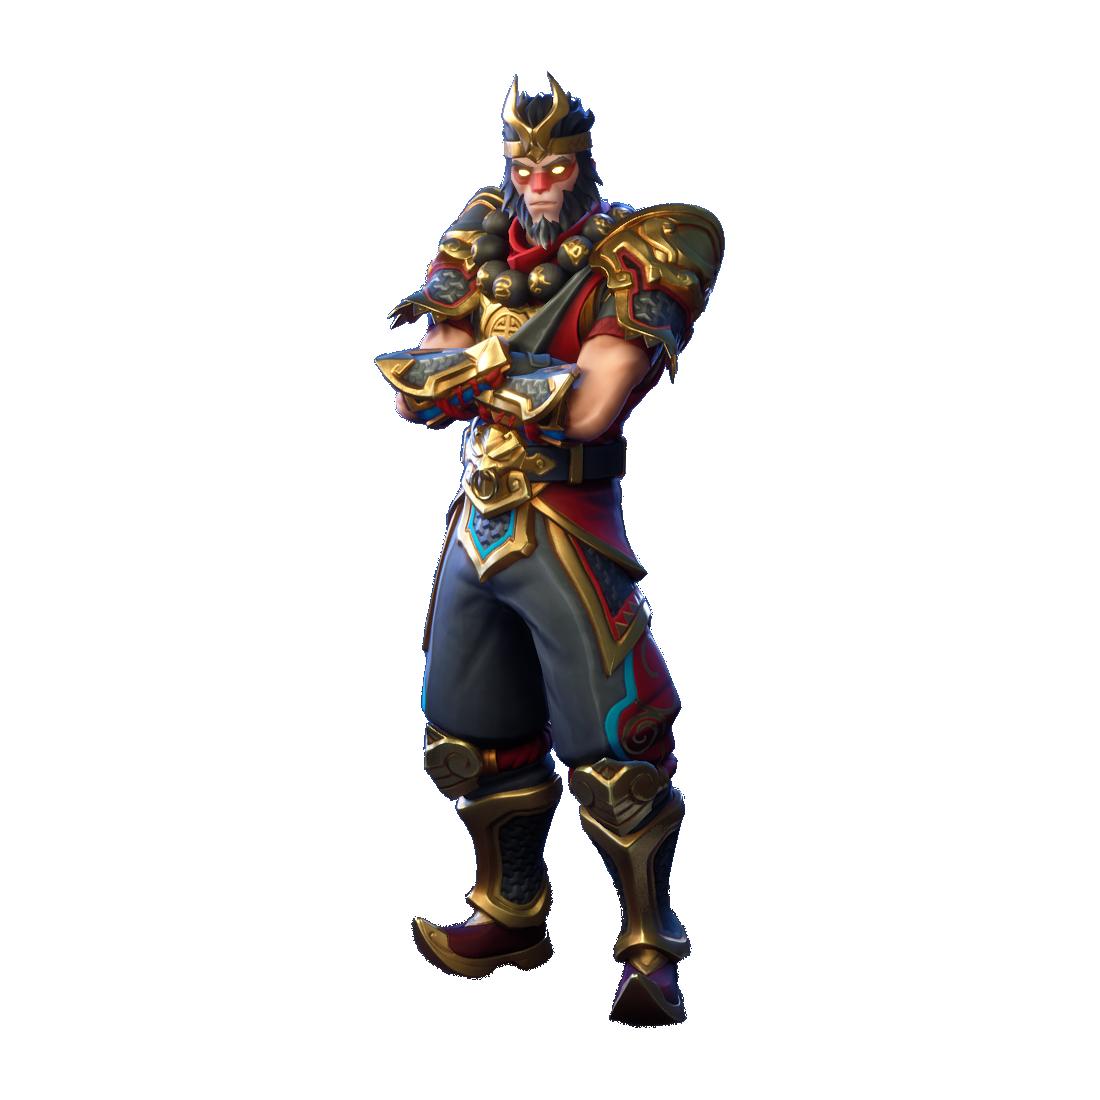 Wukong - Повелитель обезьян (Wukong)